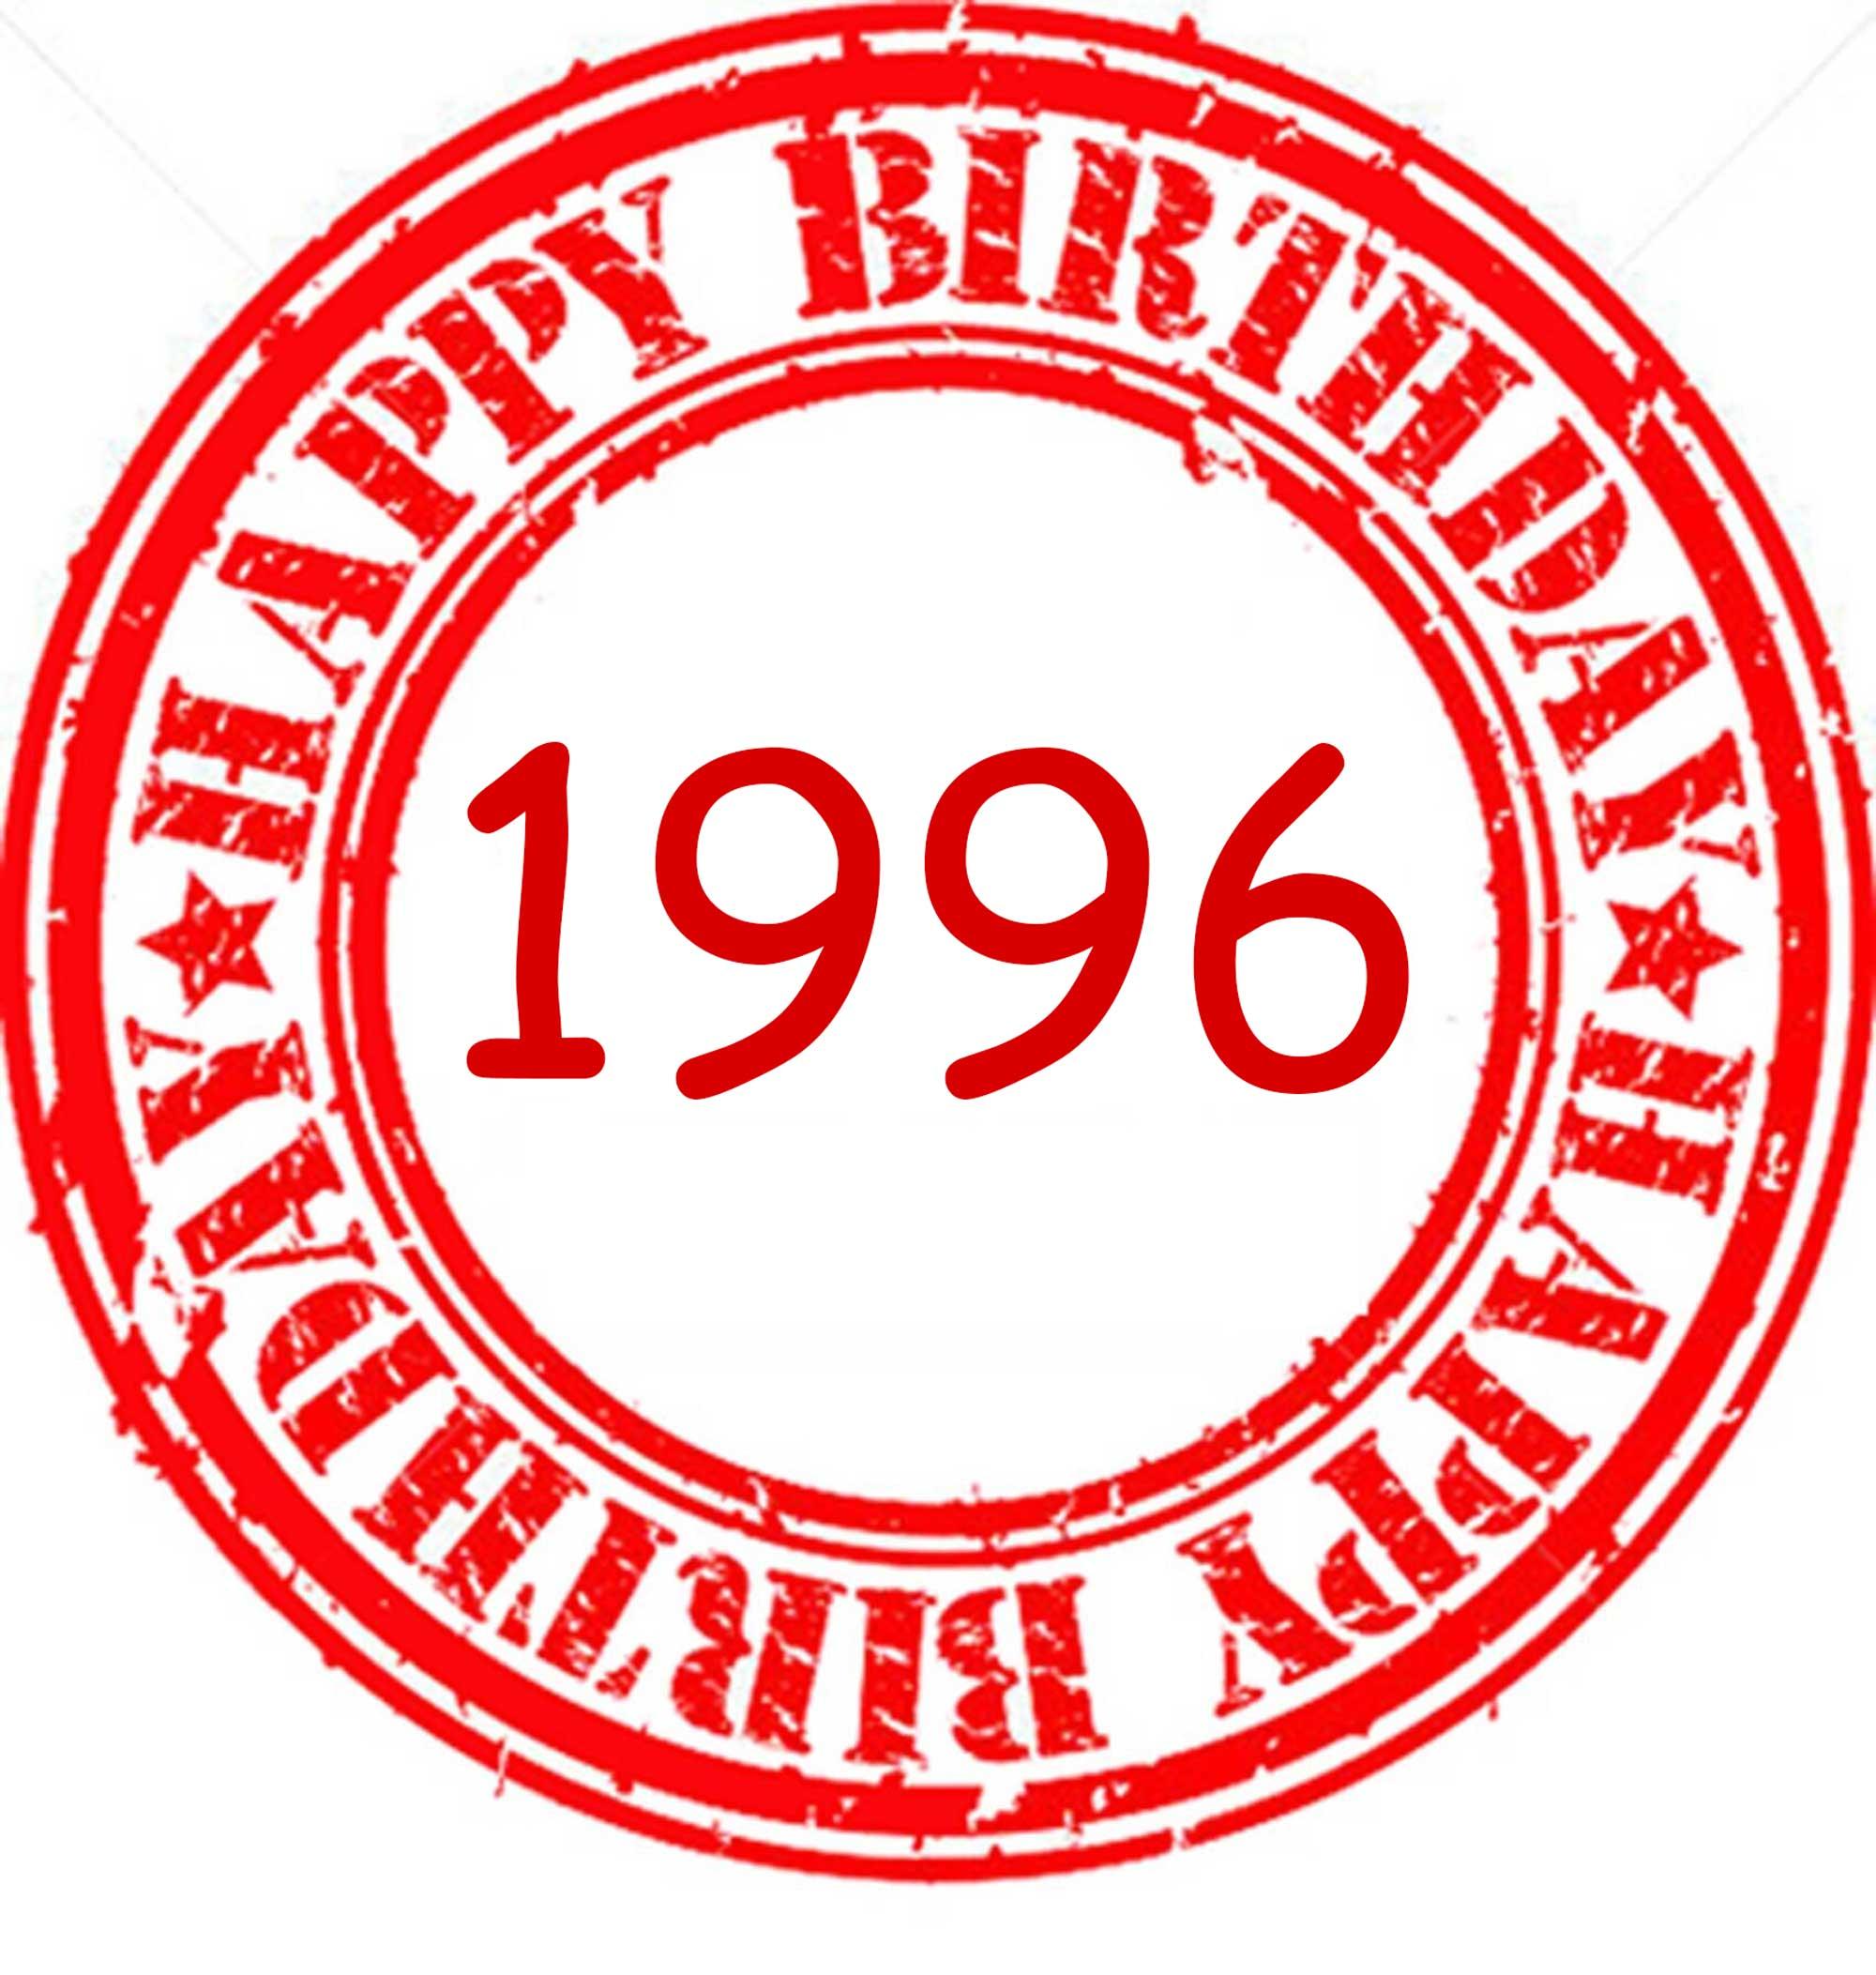 1996 sorpresa cumpleaños amiga